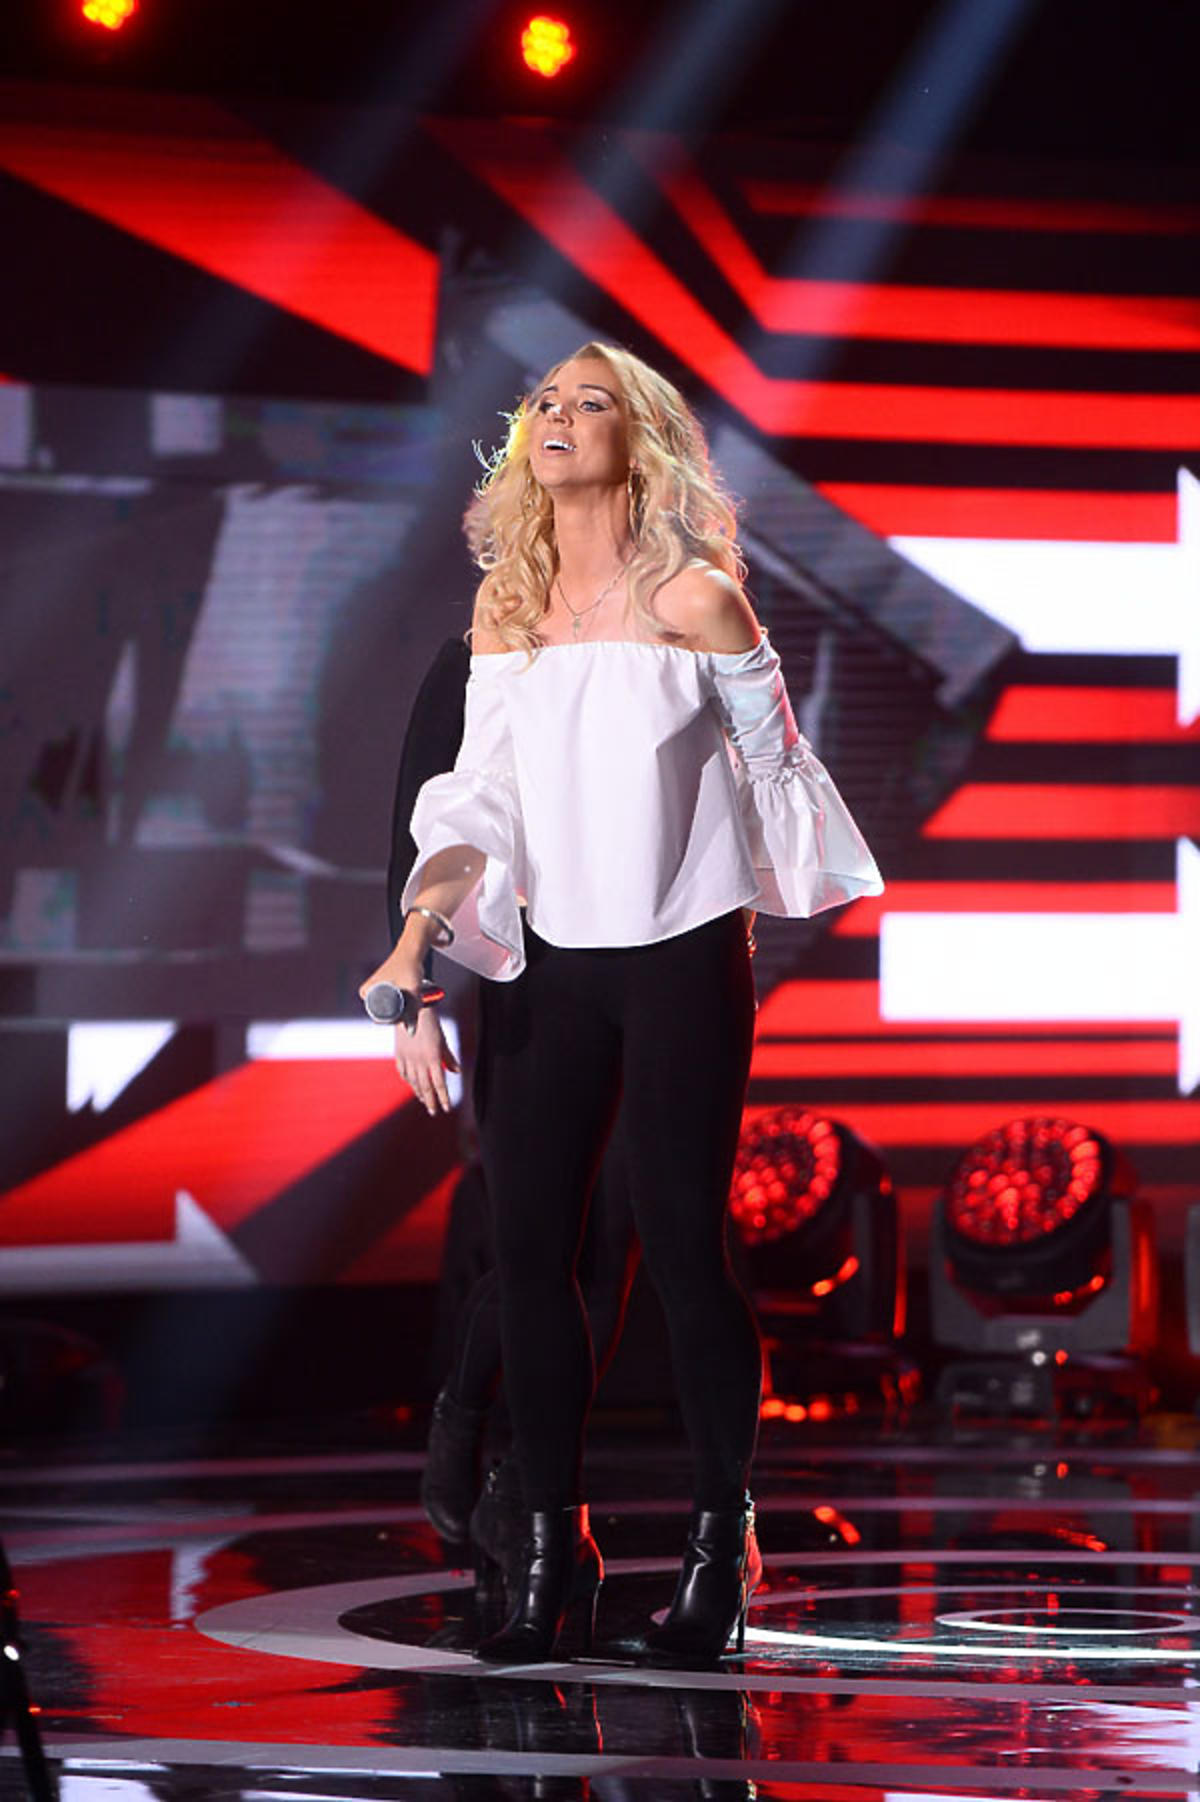 Aneta Sablik - Eurowizja 2017